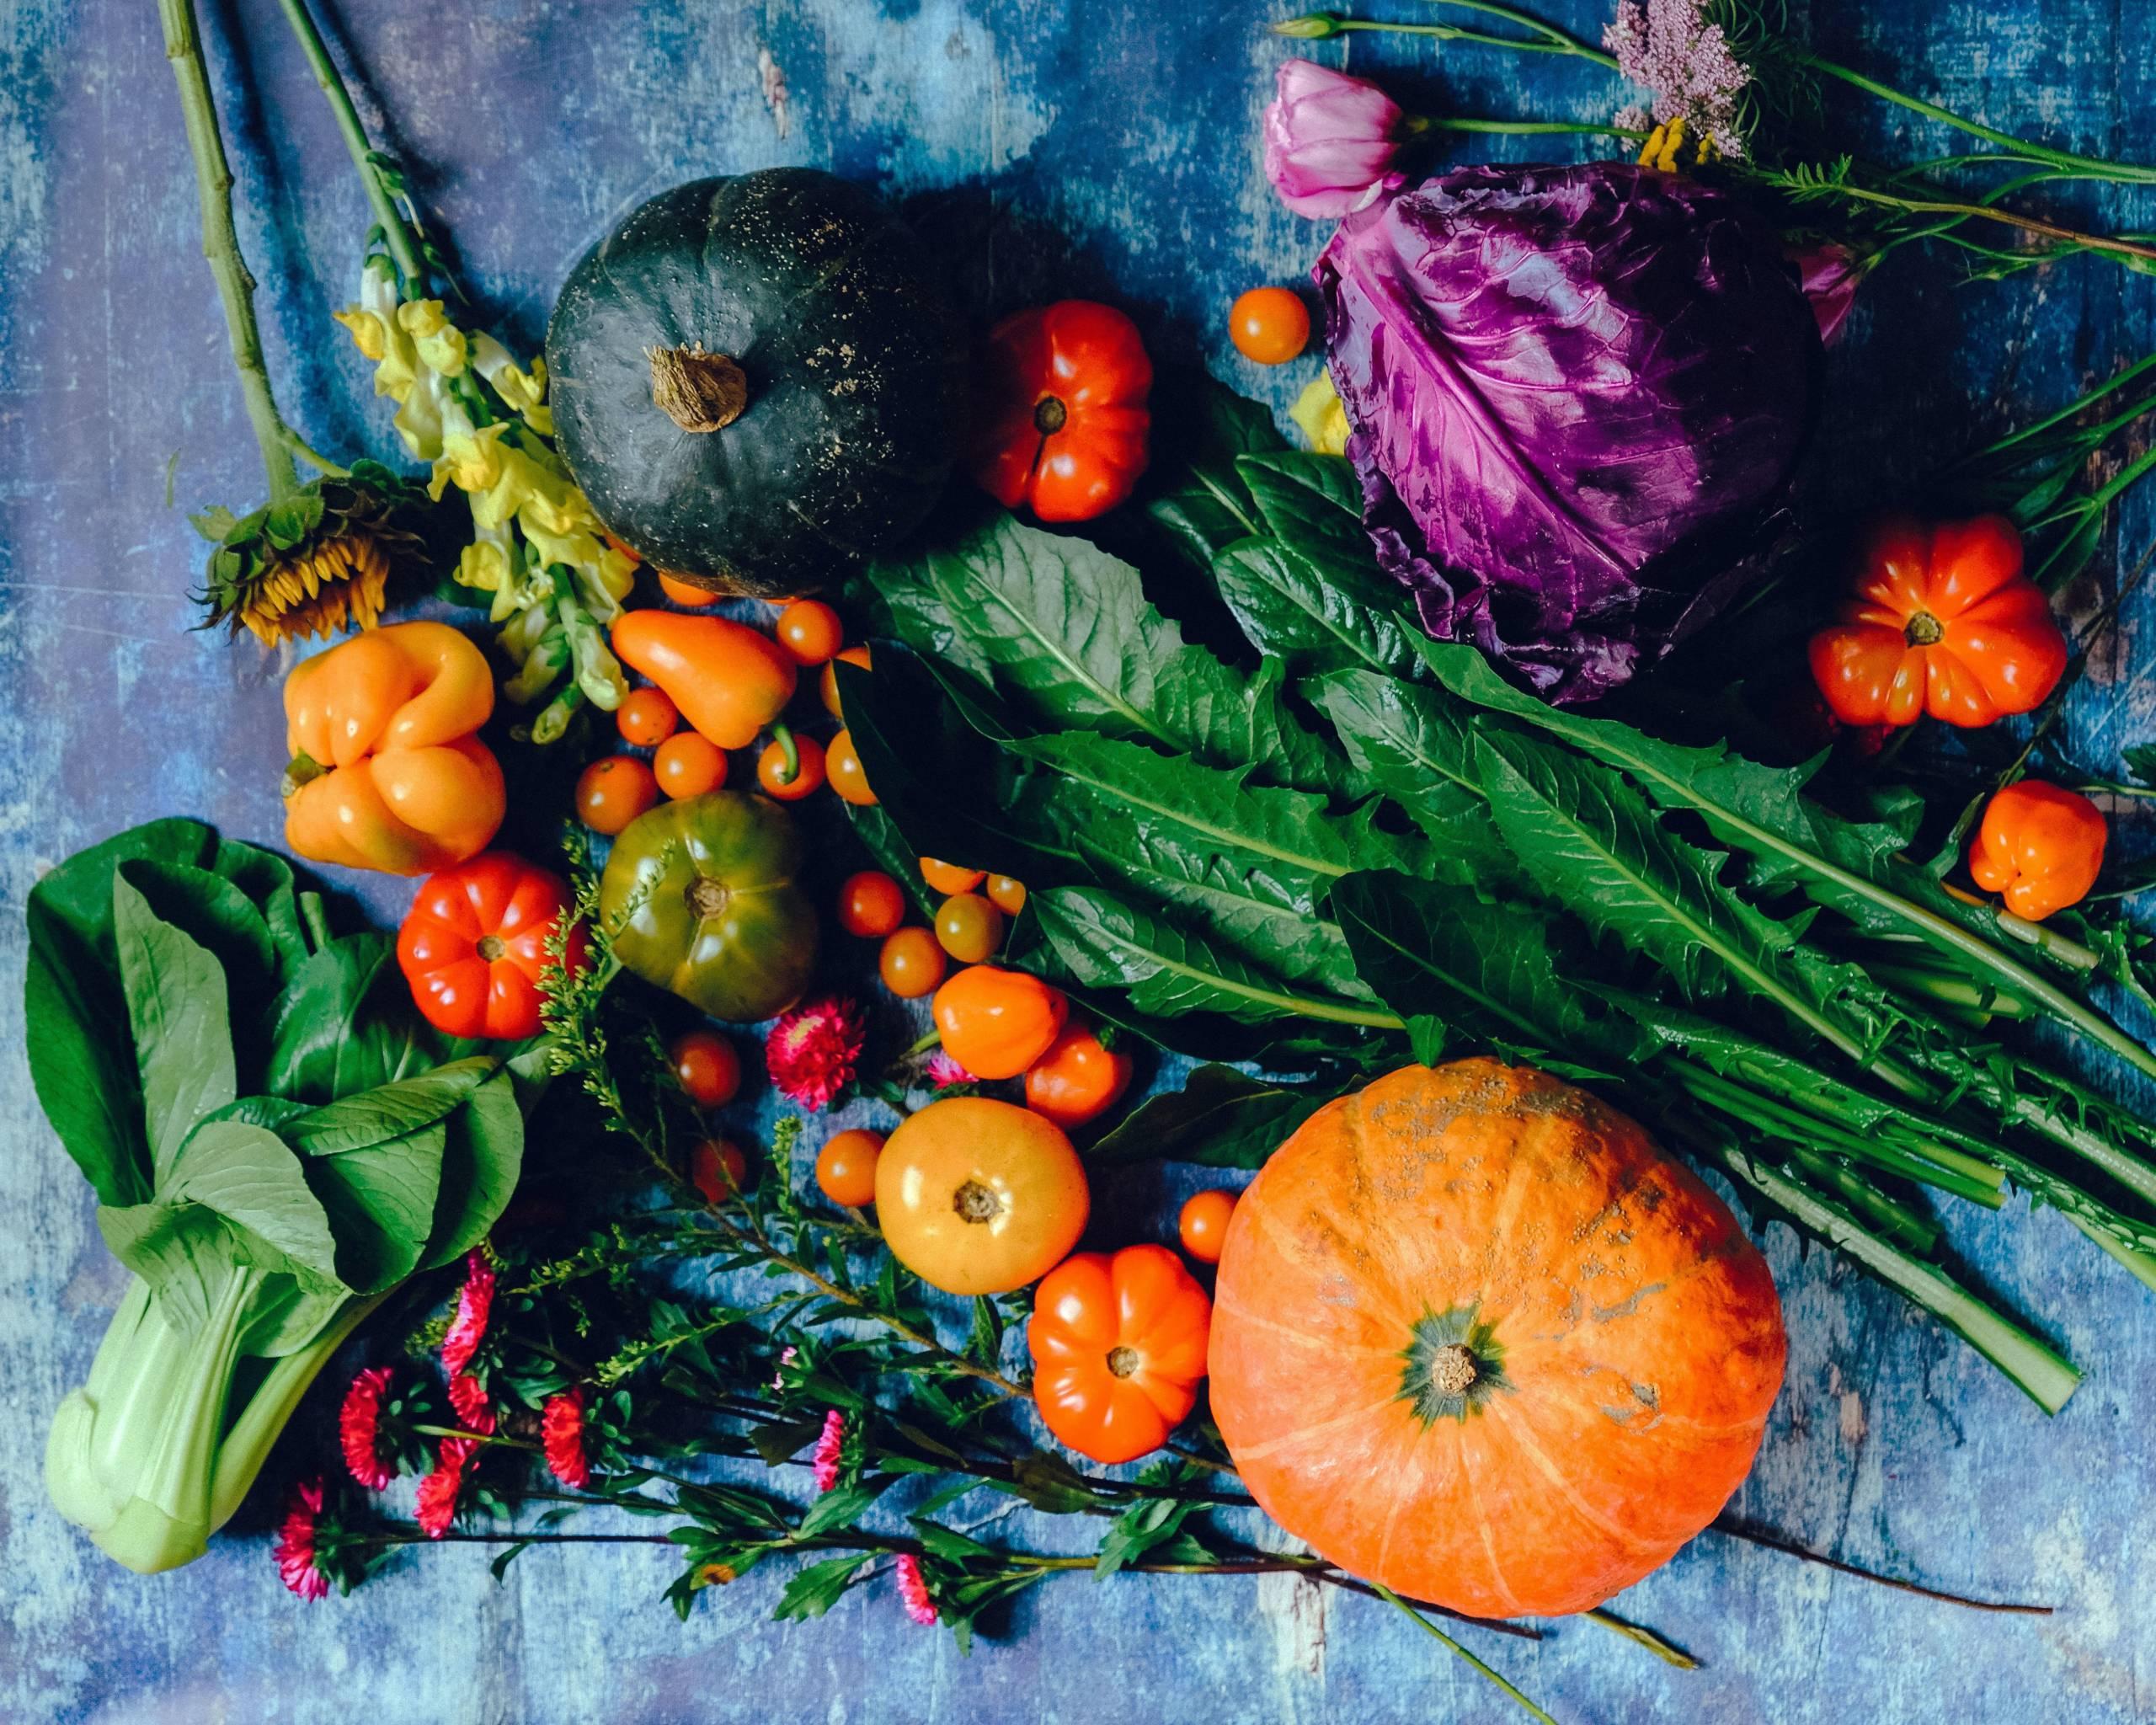 legumes-bio-skinny-croissant-biocoop-jardin-d-eden